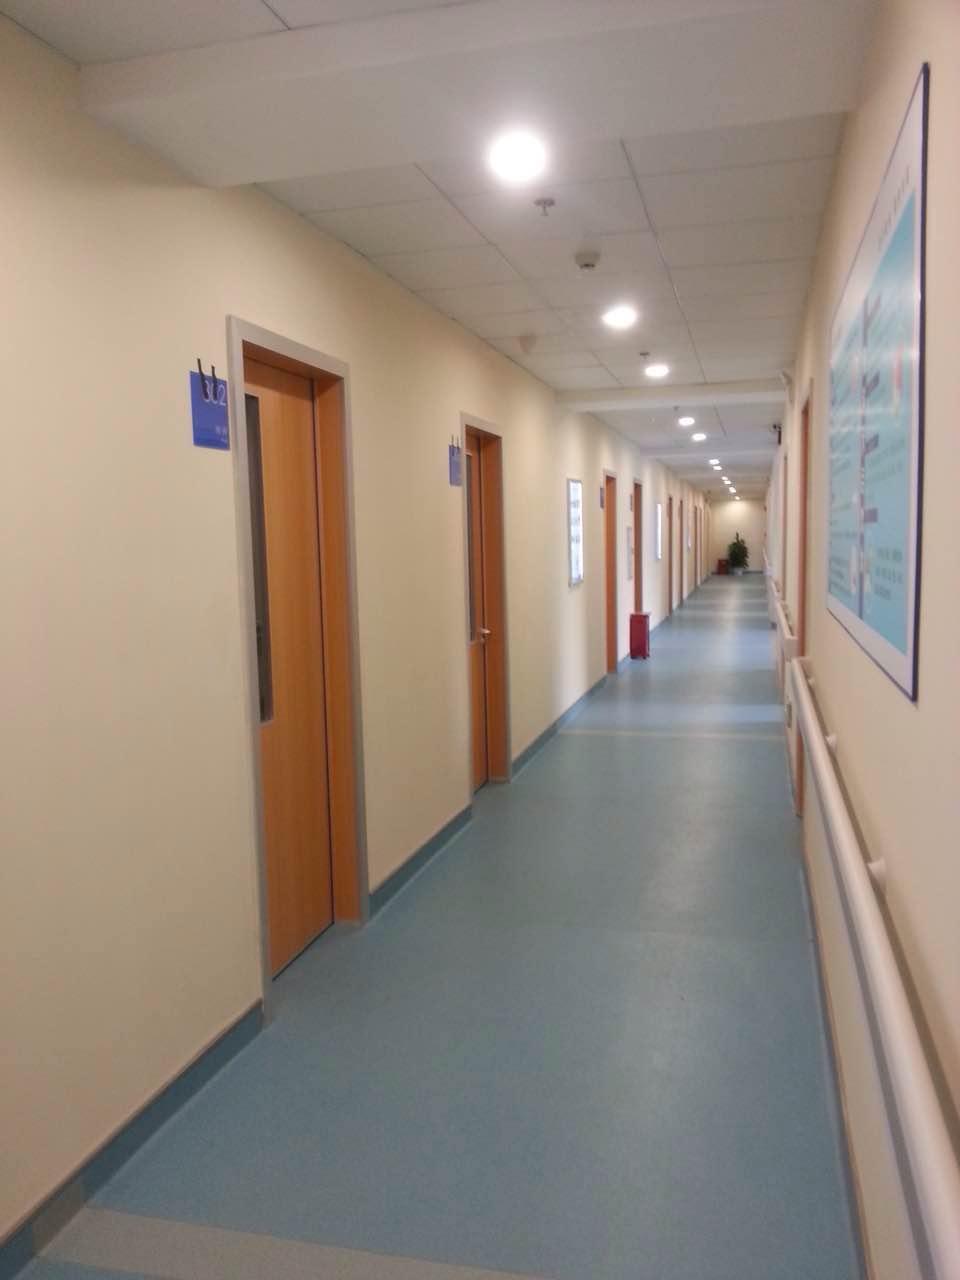 Swing Type Vip Hospital Room Doors